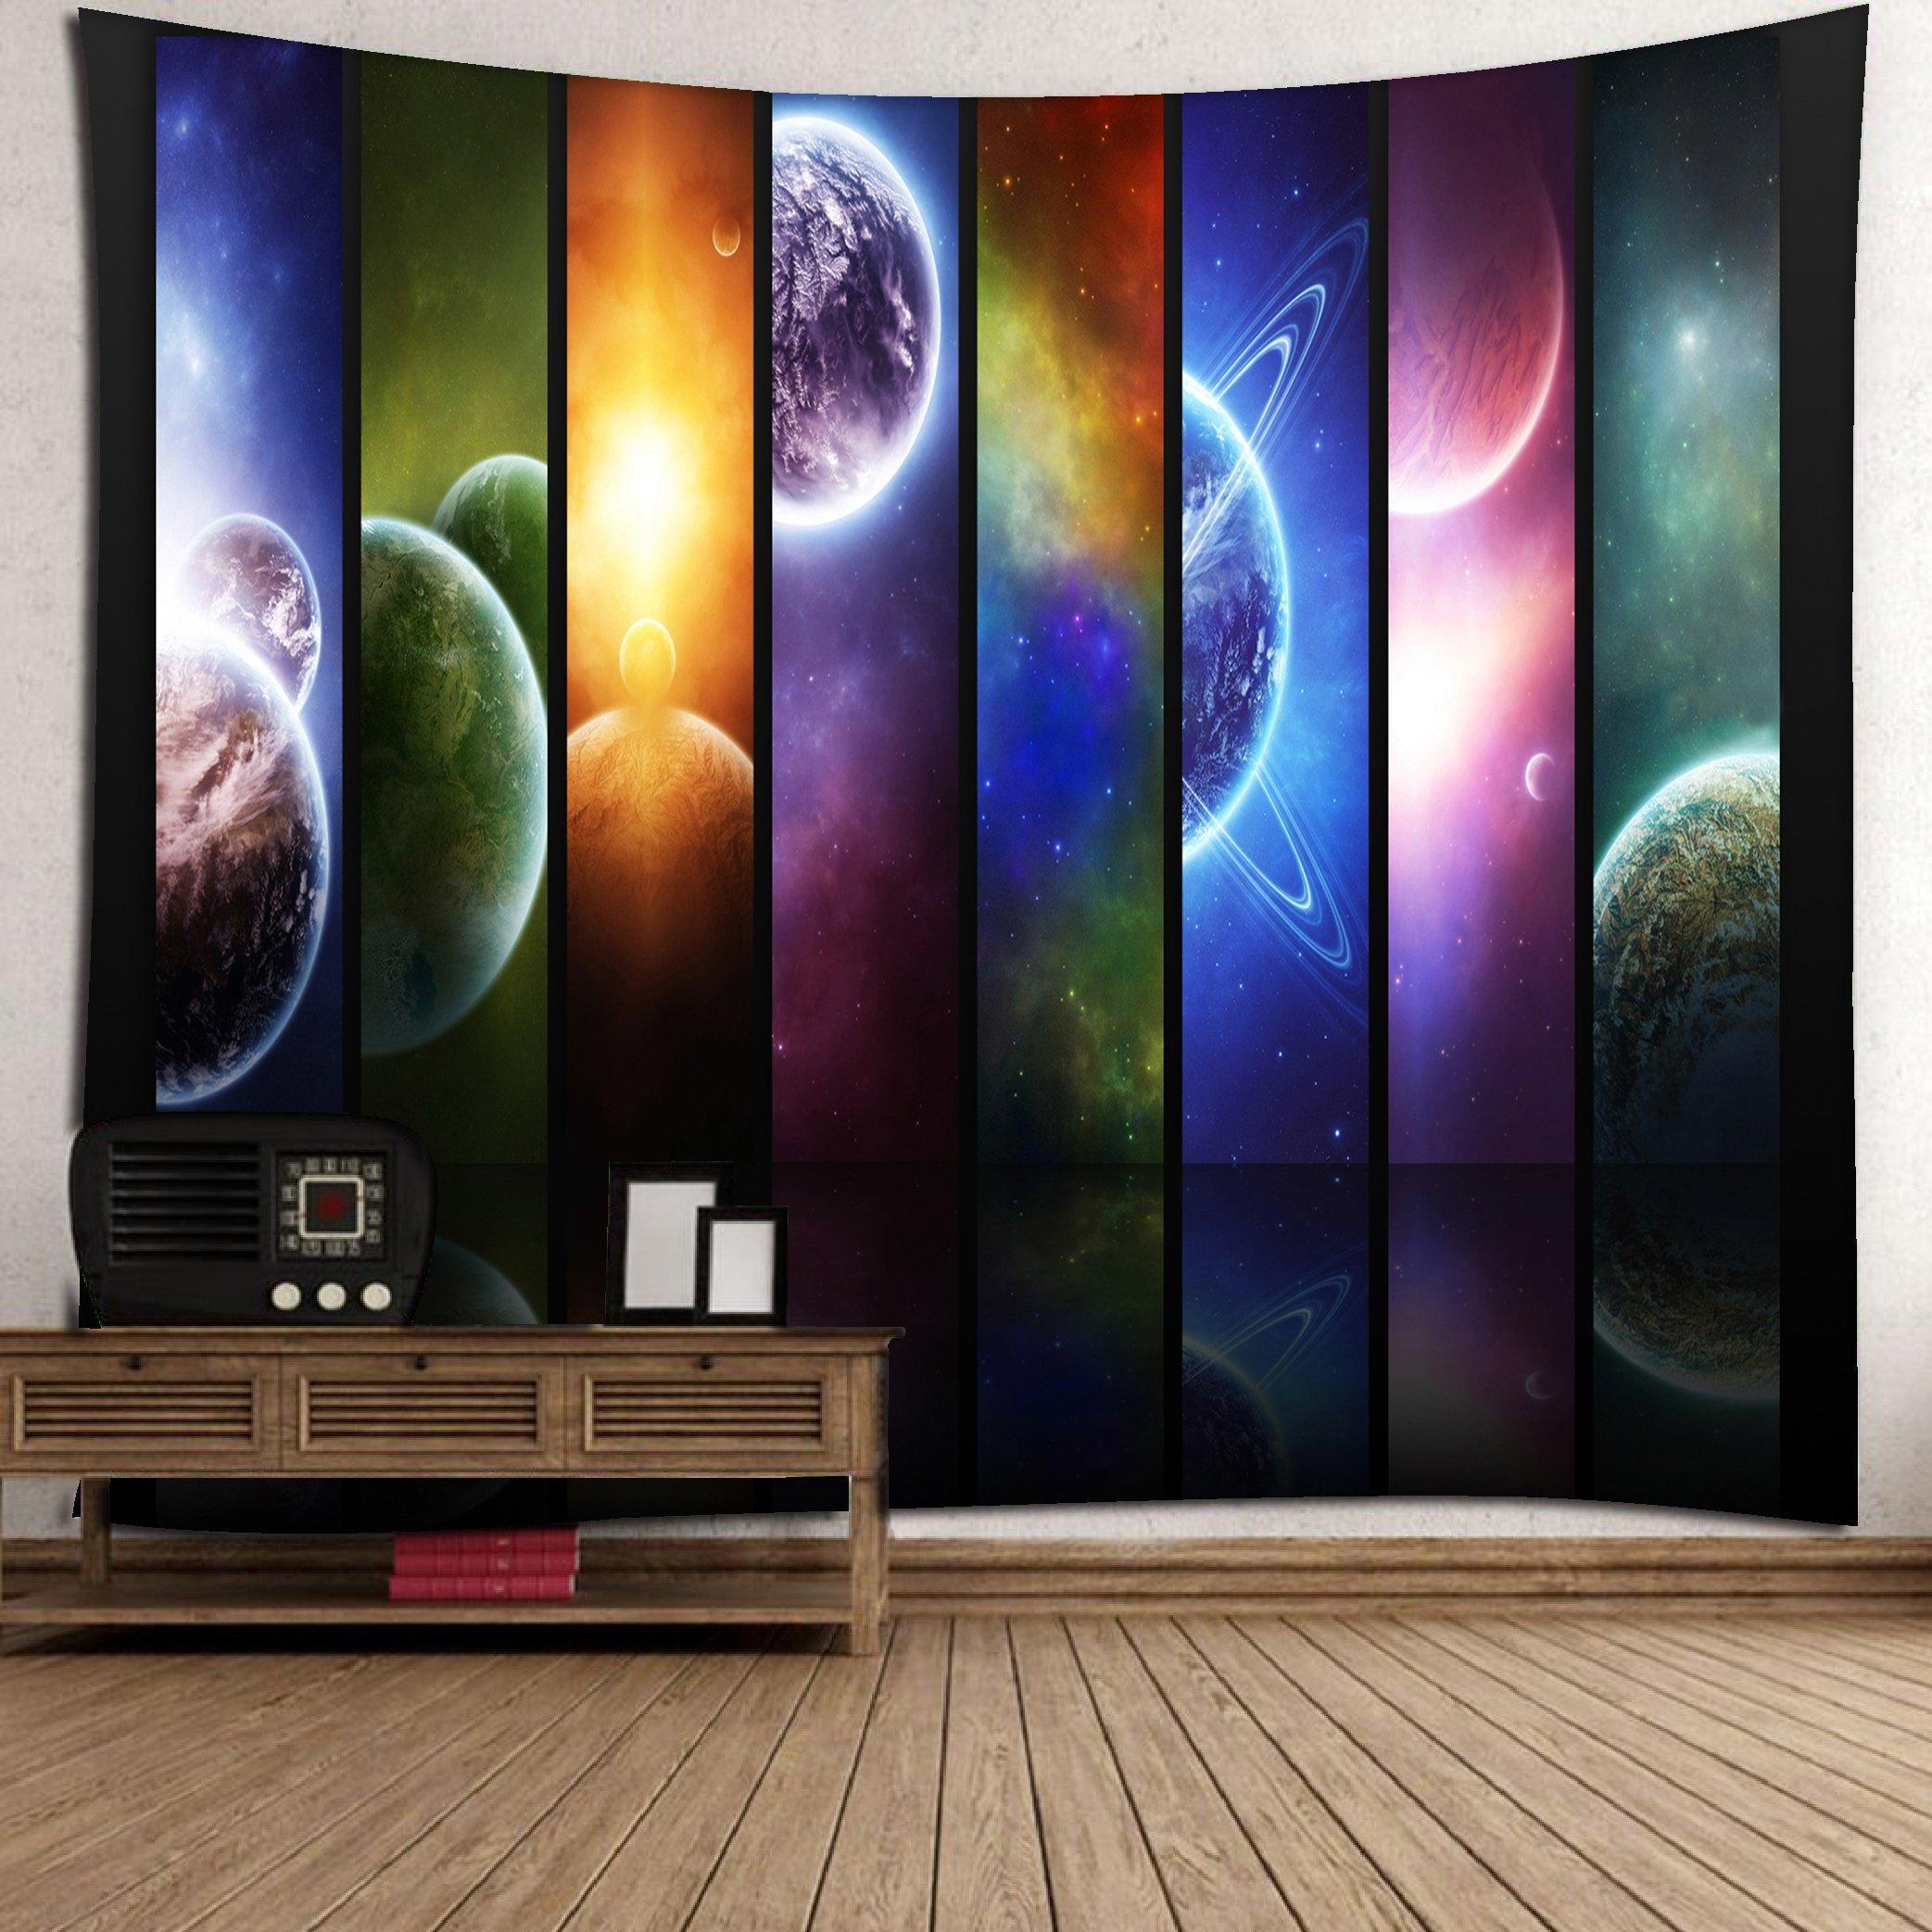 Get Orange Planet Tapestry Universe Space Educational Solar System Planets Neptune Venus Mercury Kids Science Room Horizontal Art, Bedroom Living Room Dorm Wall Hanging 80X60Inch